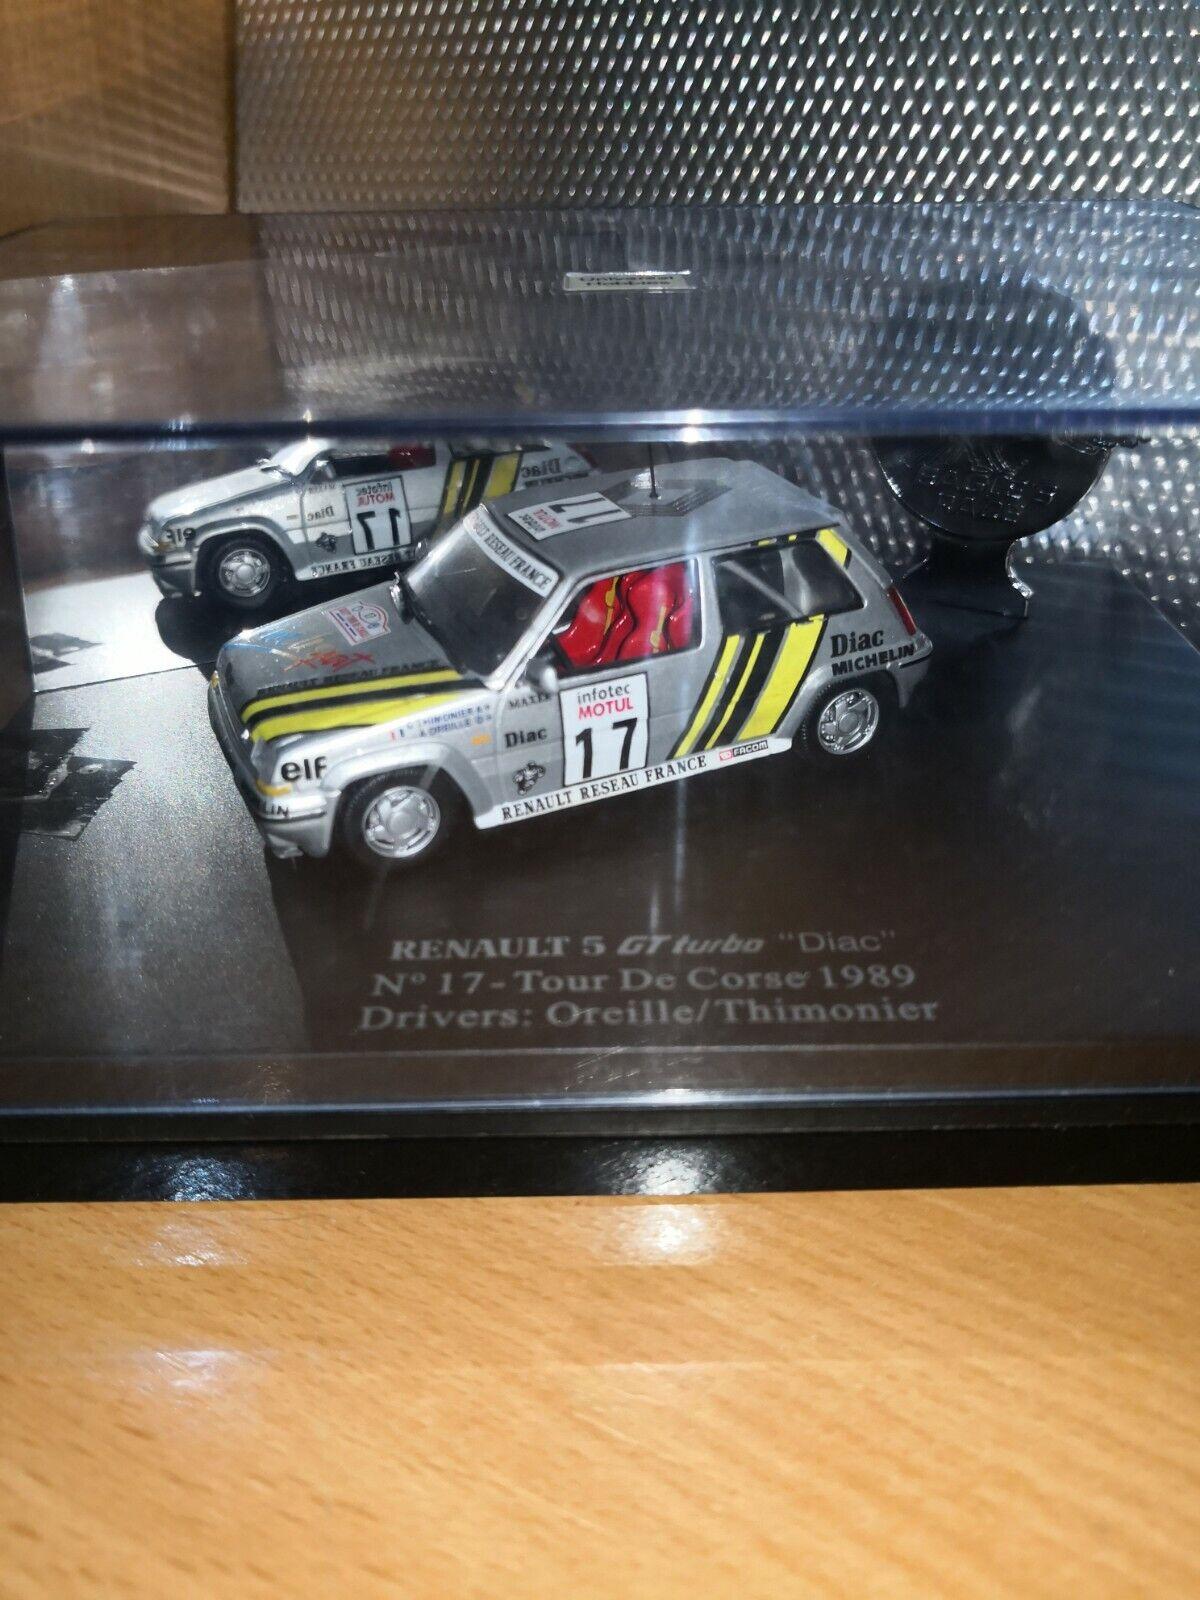 Renault 5 gt turbo Diac uh 1 43